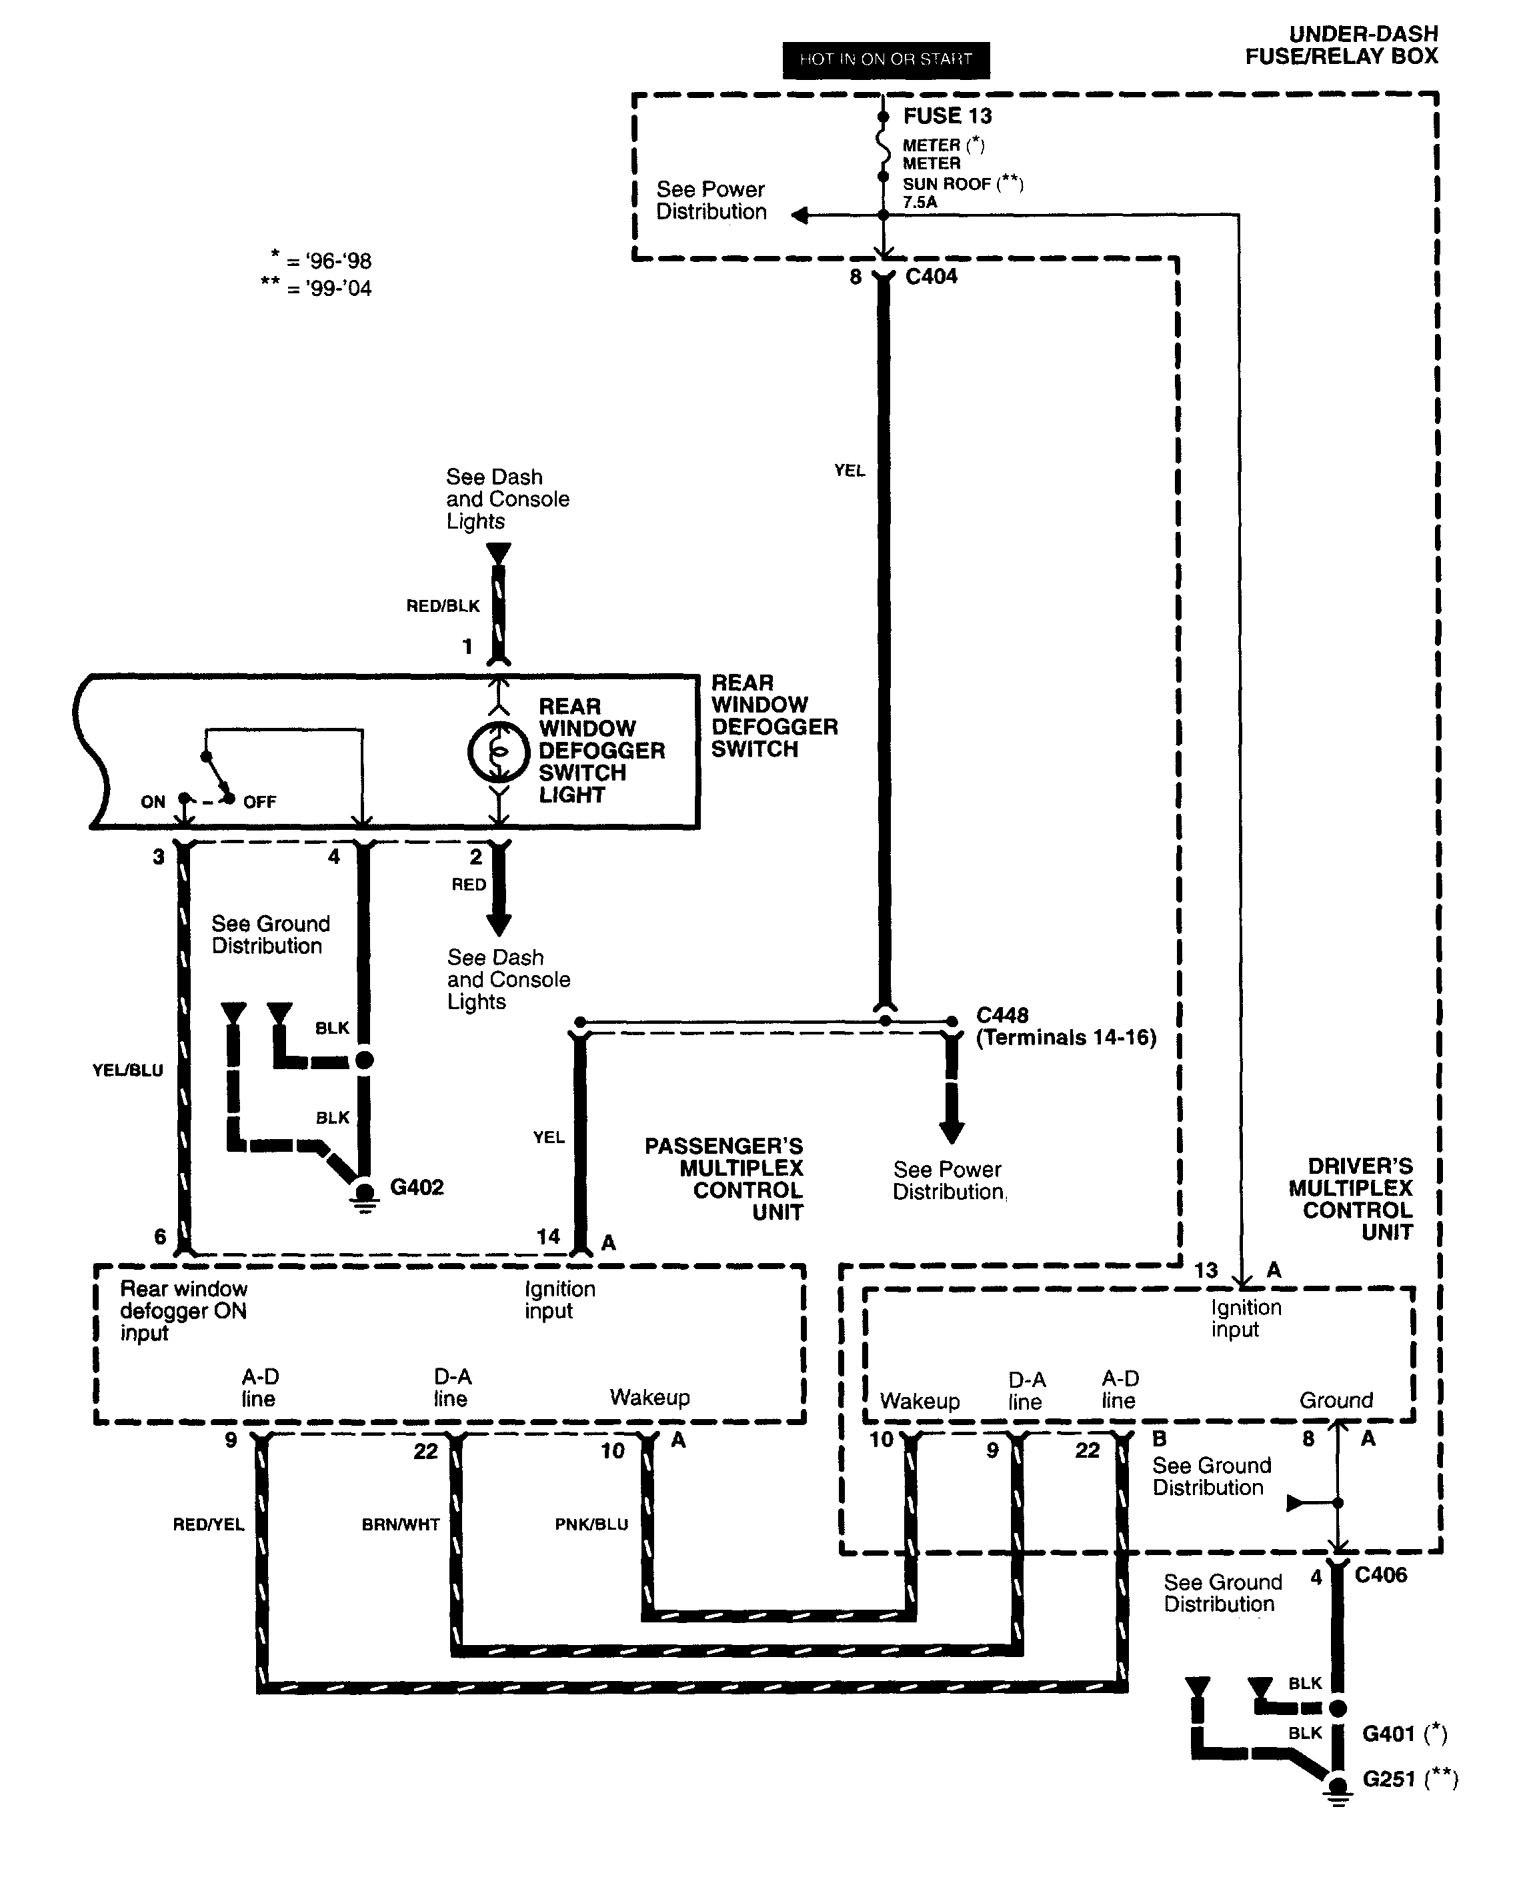 hight resolution of 2003 subaru rear defrost wiring harness diagram wiring diagram g82003 subaru rear defrost wiring harness diagram